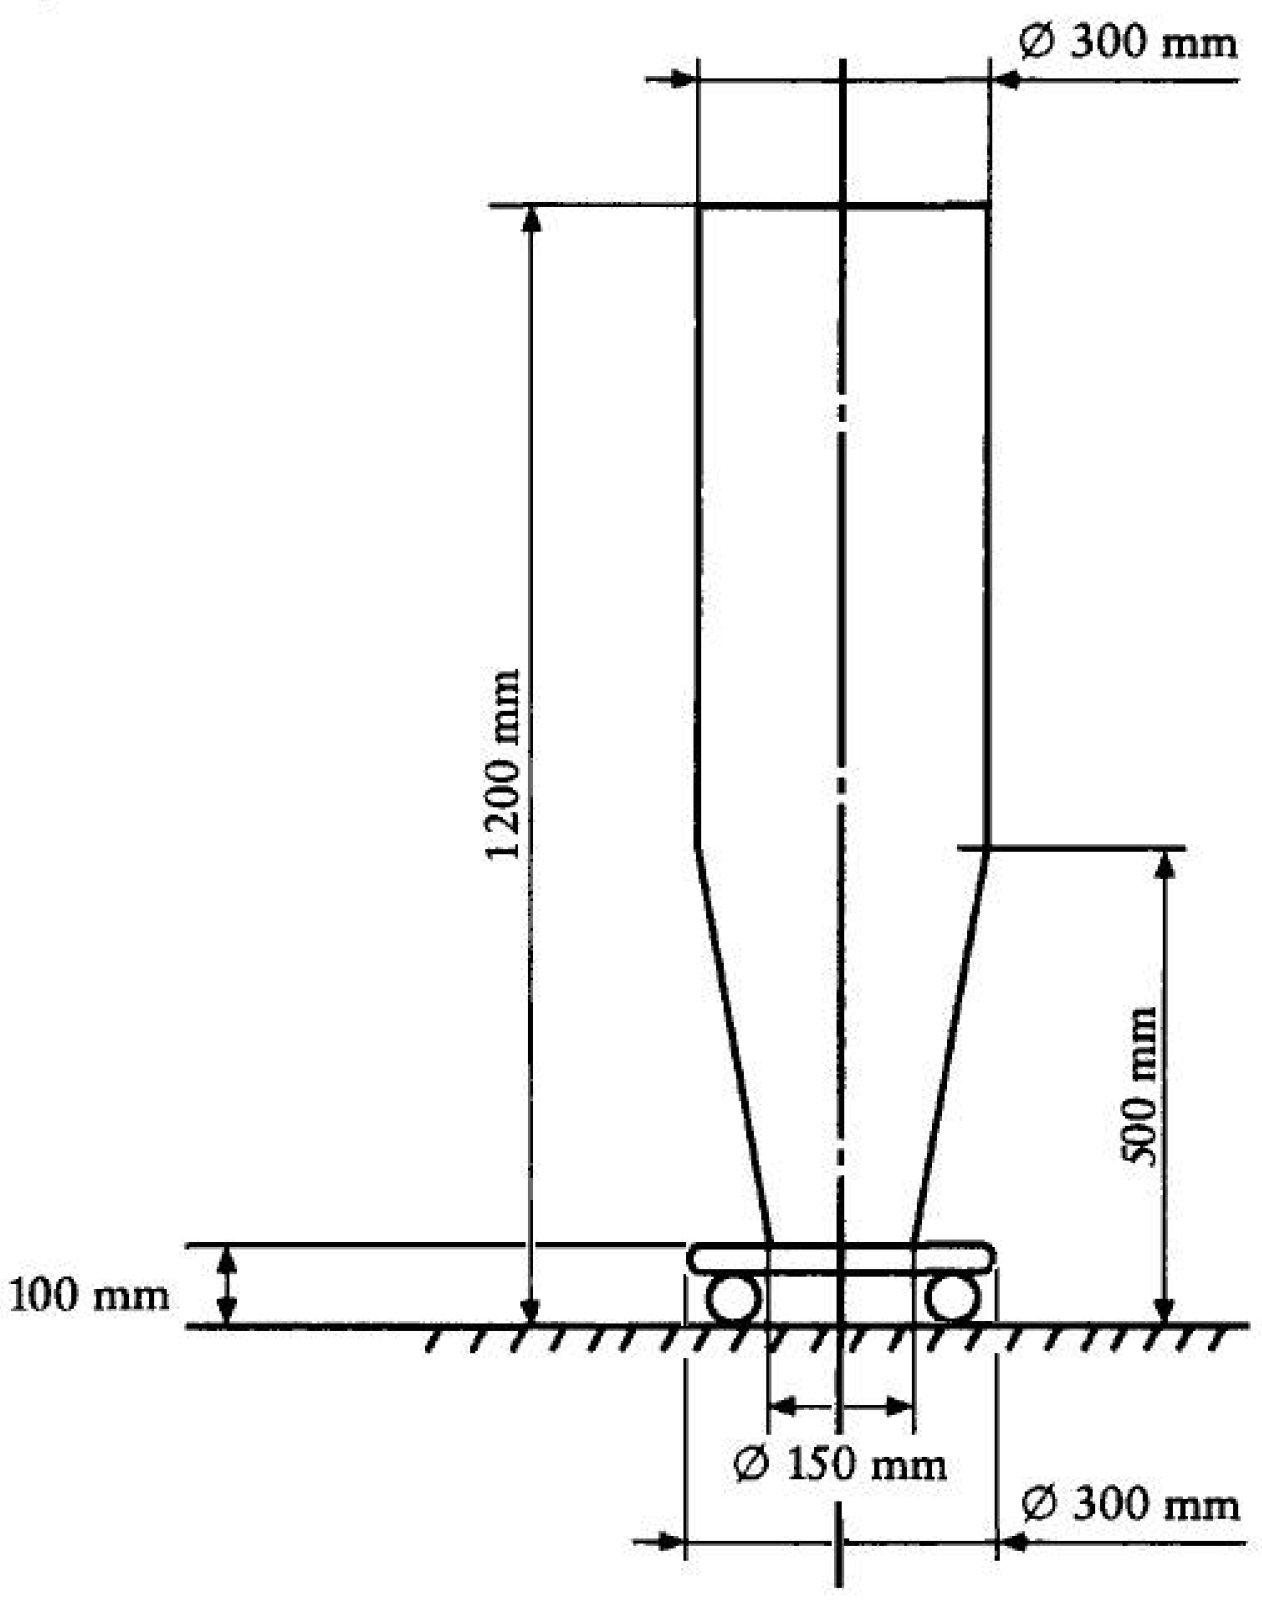 Eur Lex 02014r0044 20180320 En Wiring Diagram Likewise Catalytic Converter On Hayabusa Fuel Pump Image